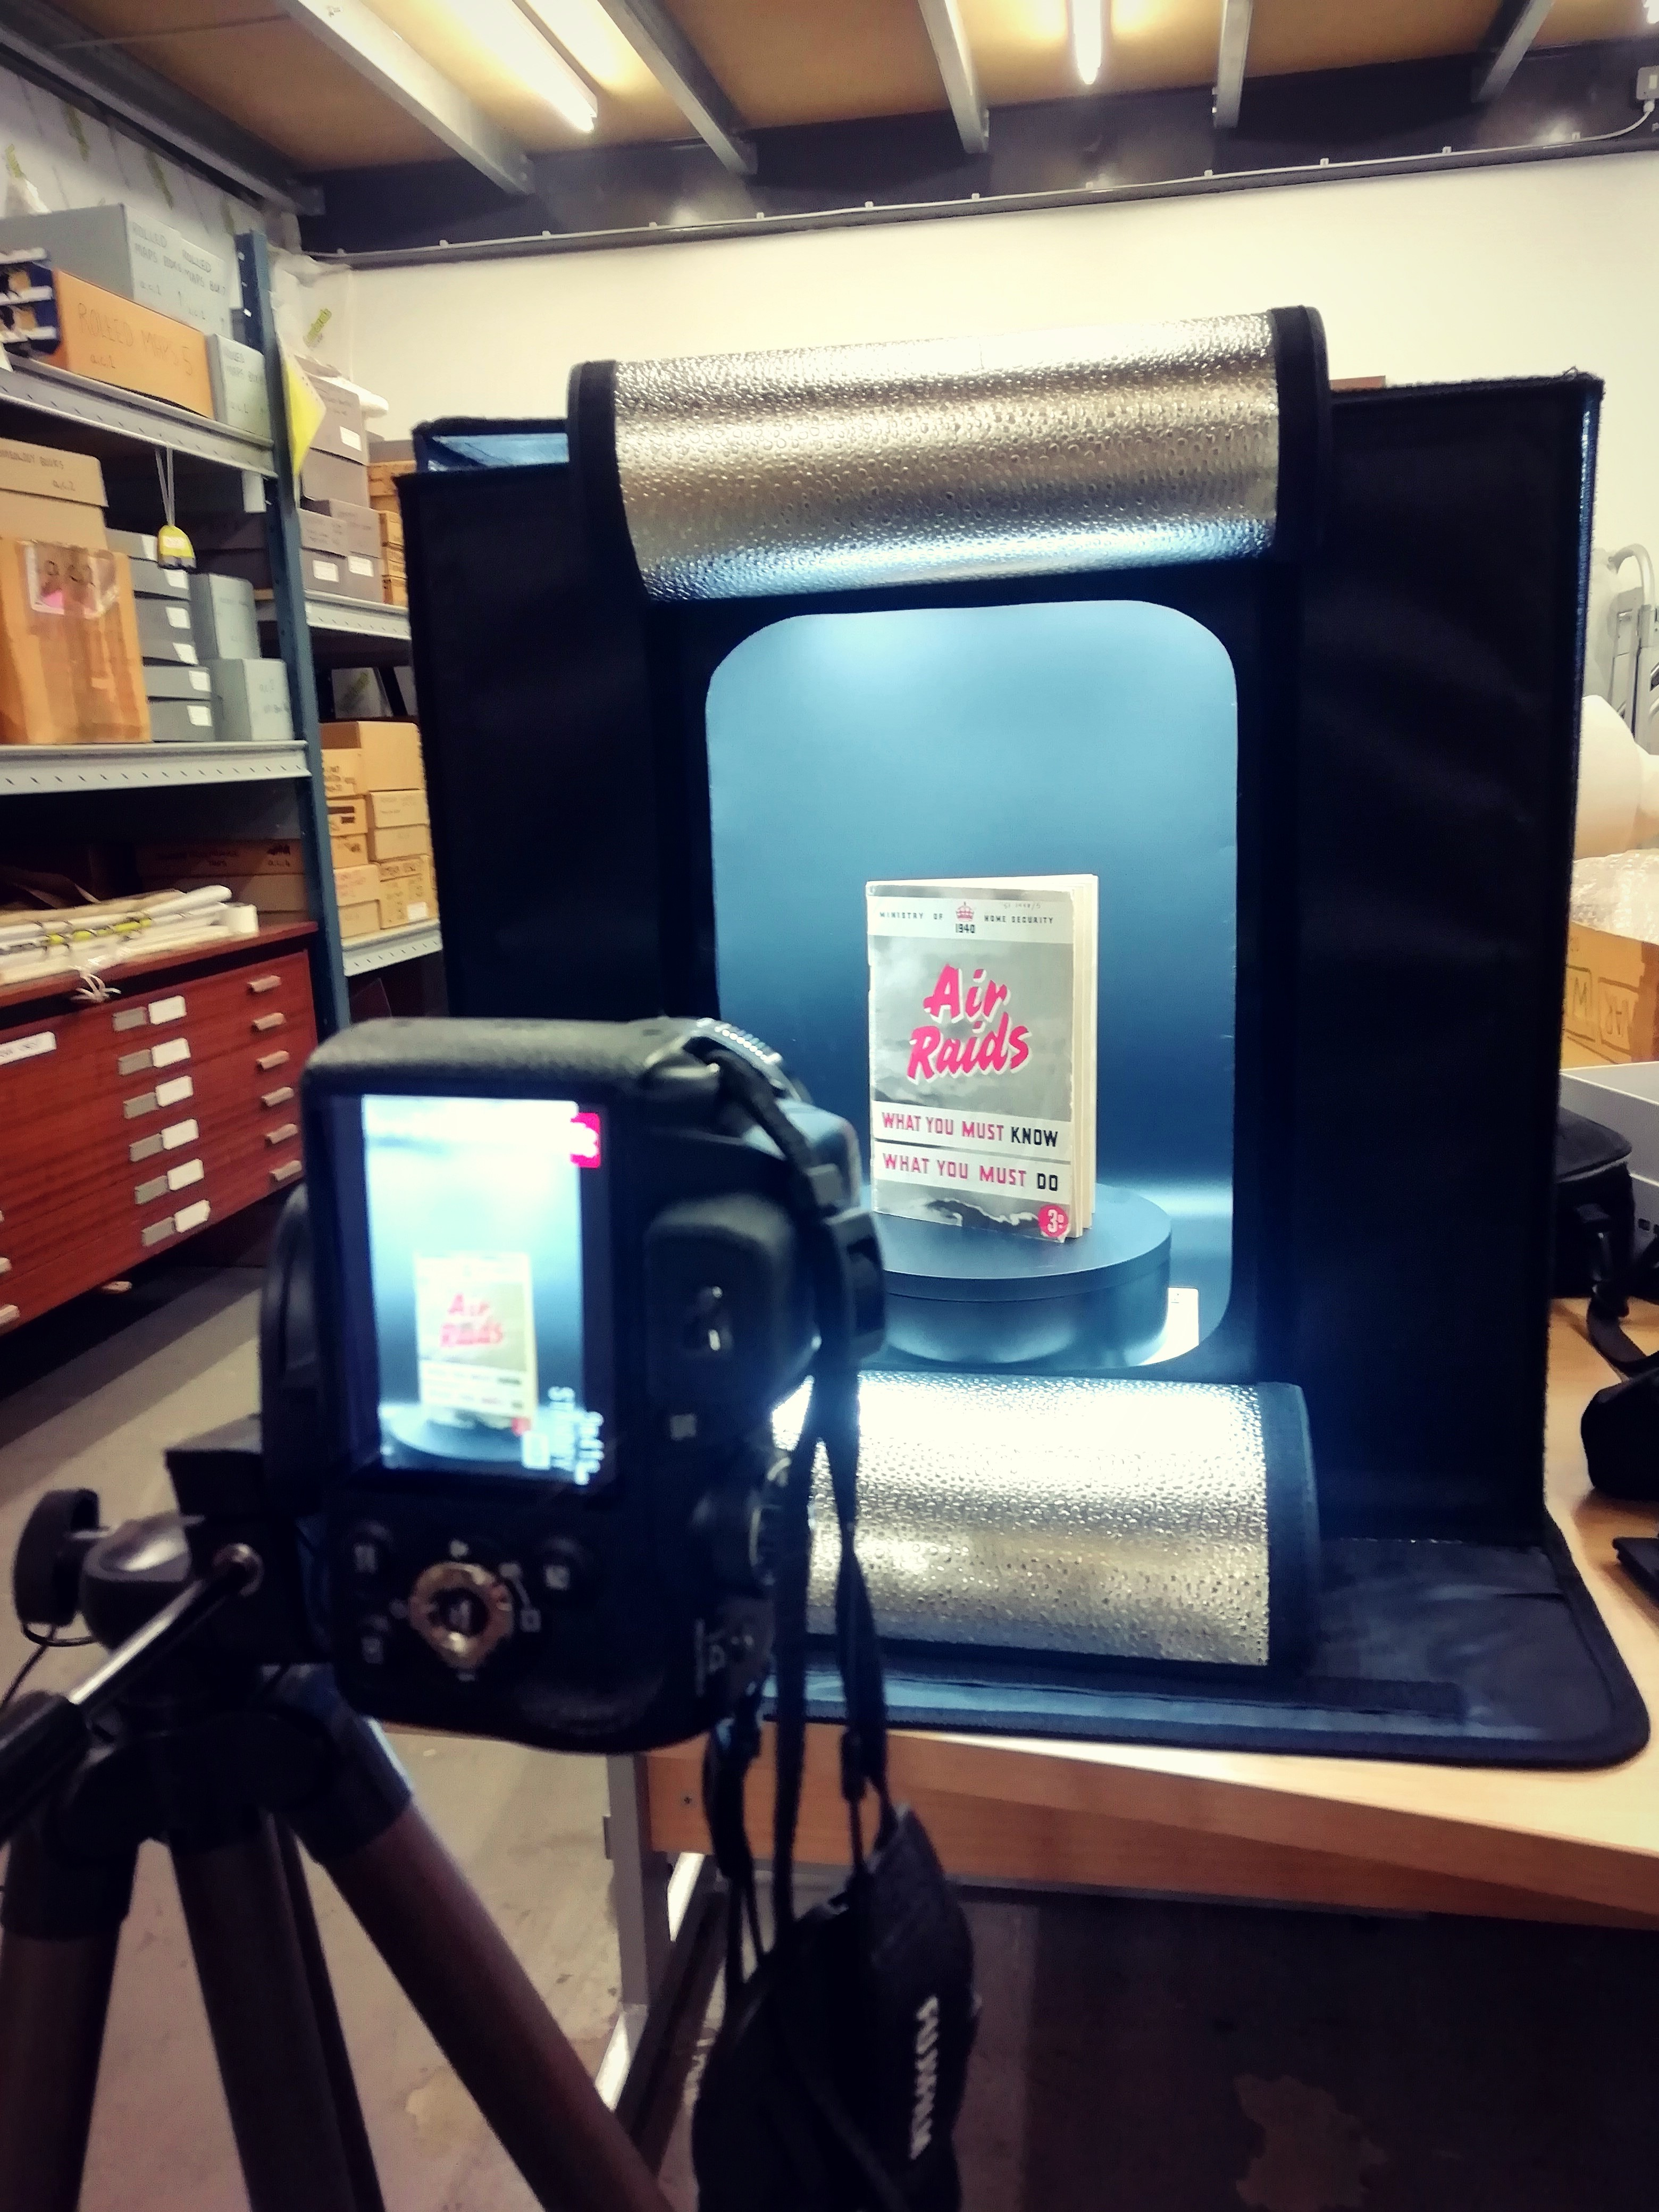 Camera and lightbox